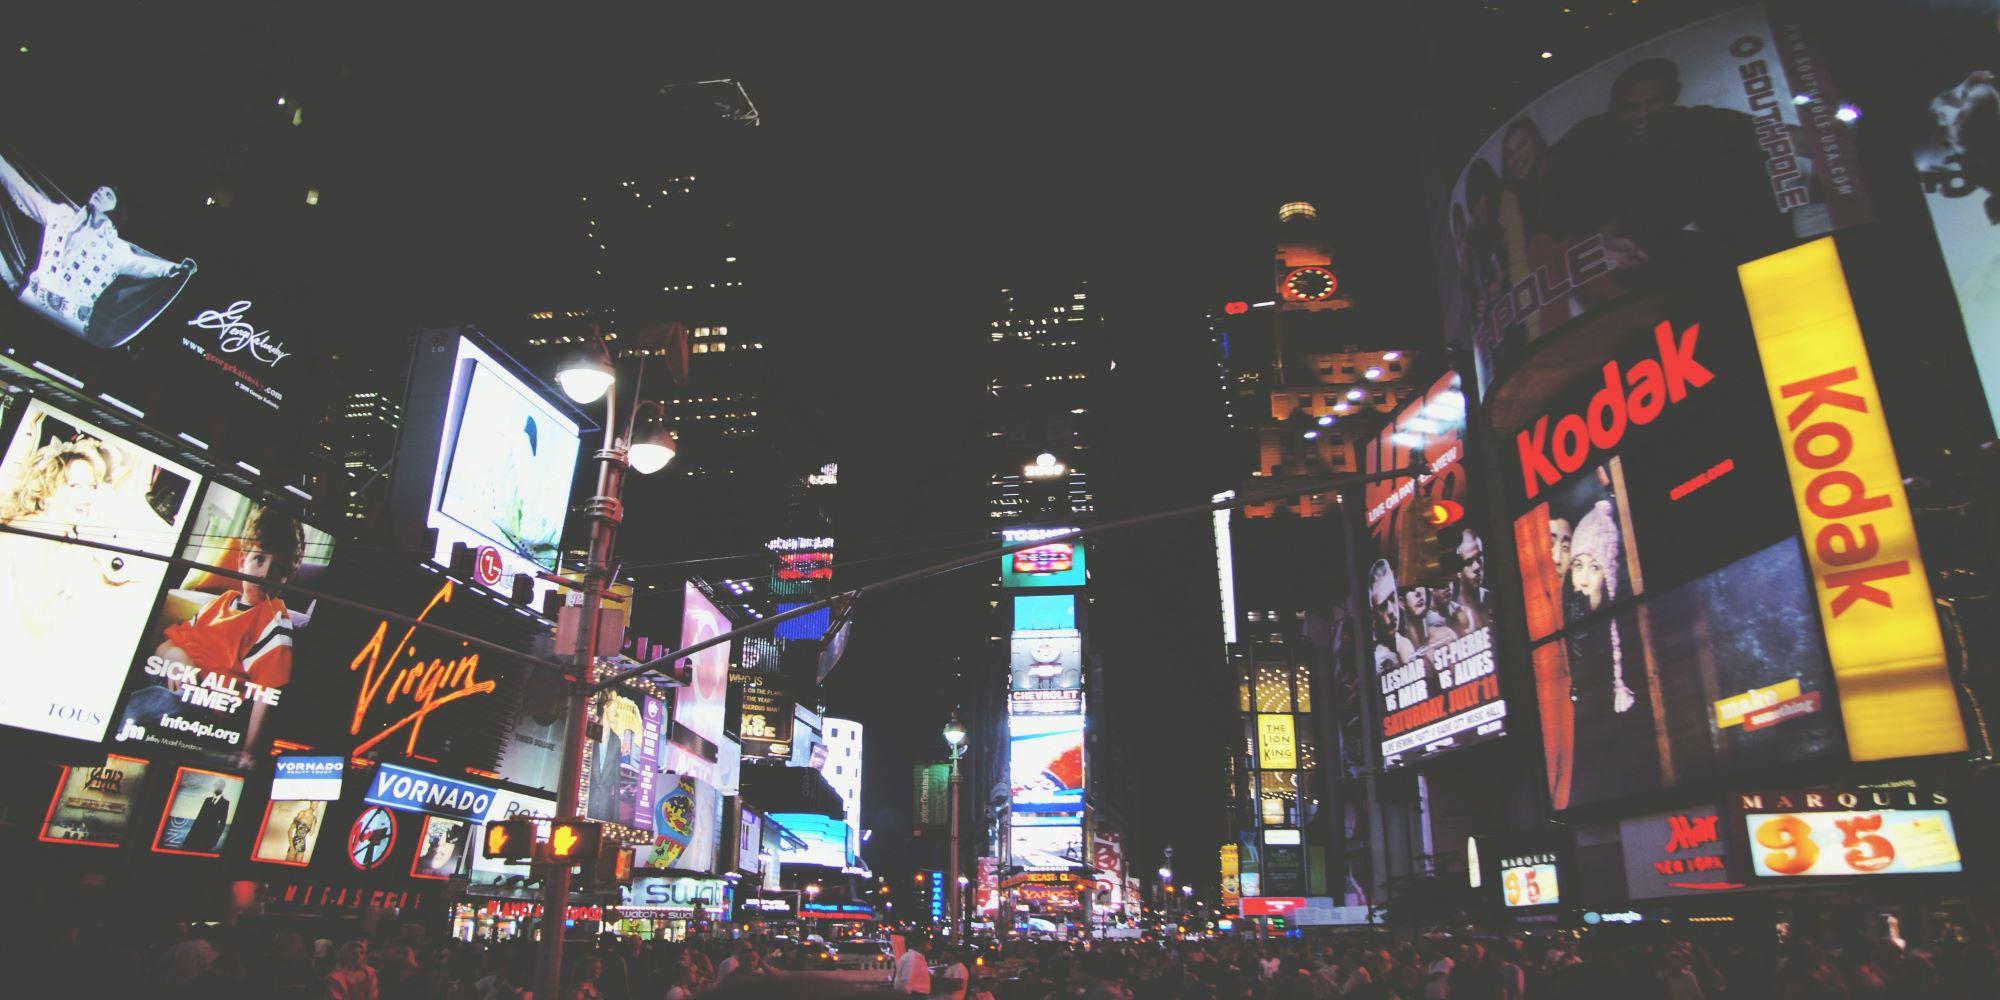 International Marketing News: US Sectors Expect Digital Ad Spend Lift